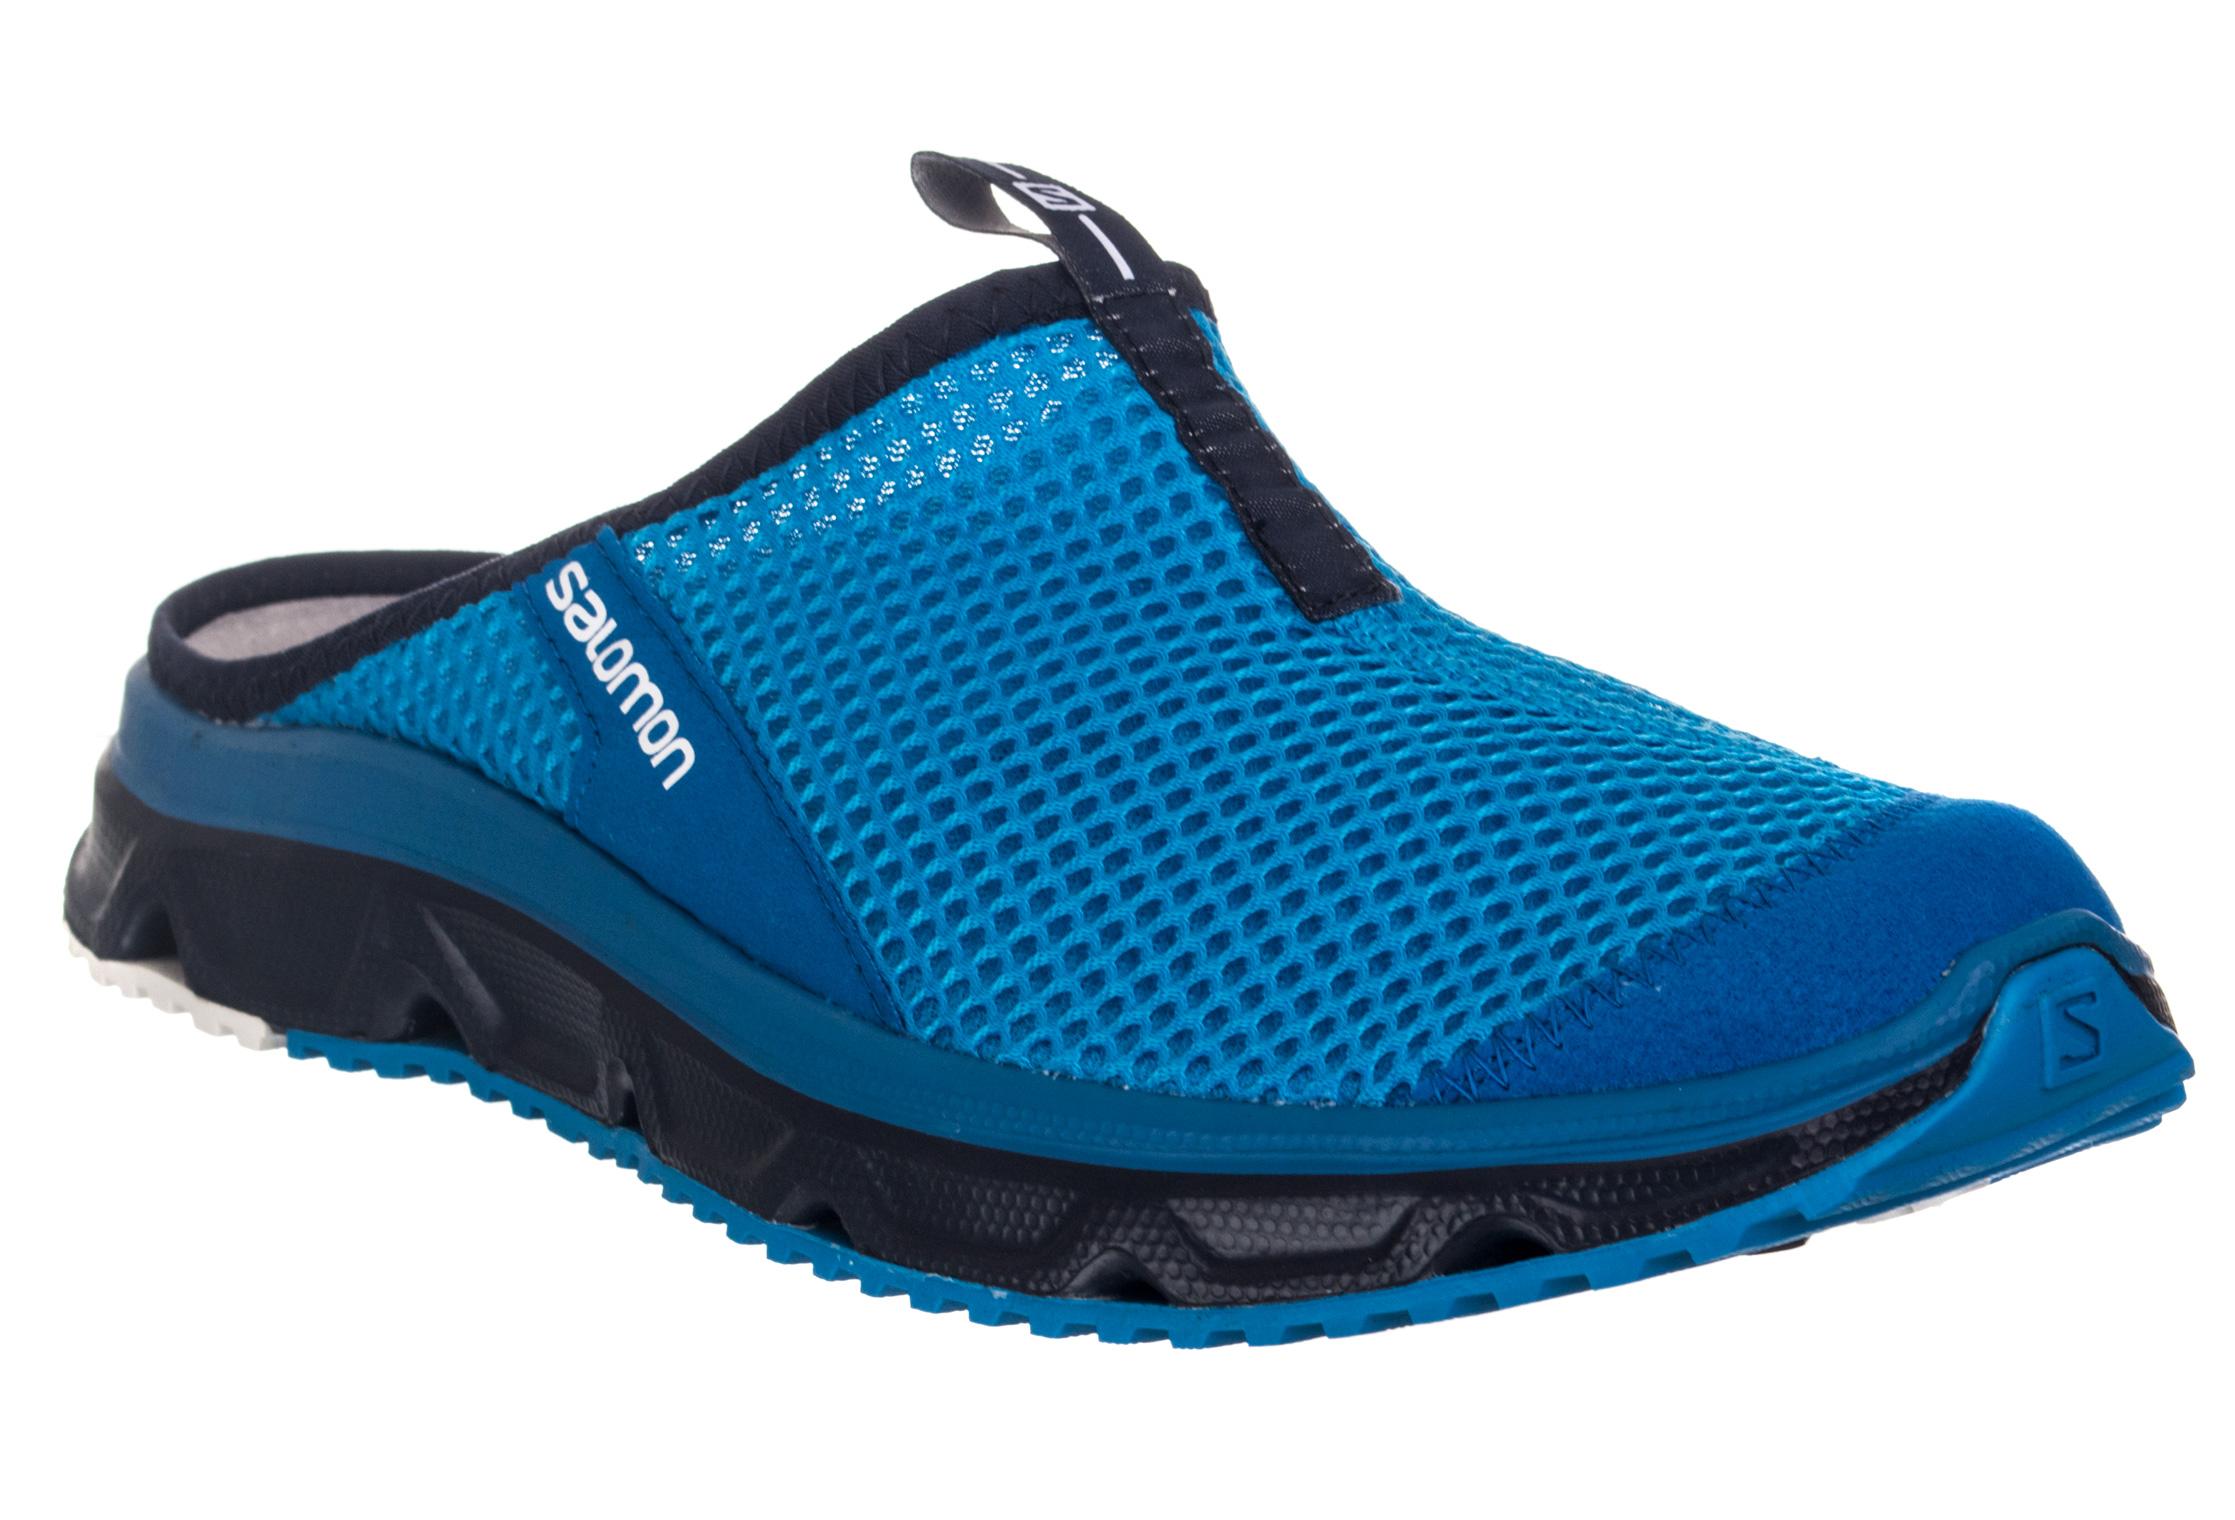 salomon rx slide 3 0 recovery shoes blue. Black Bedroom Furniture Sets. Home Design Ideas